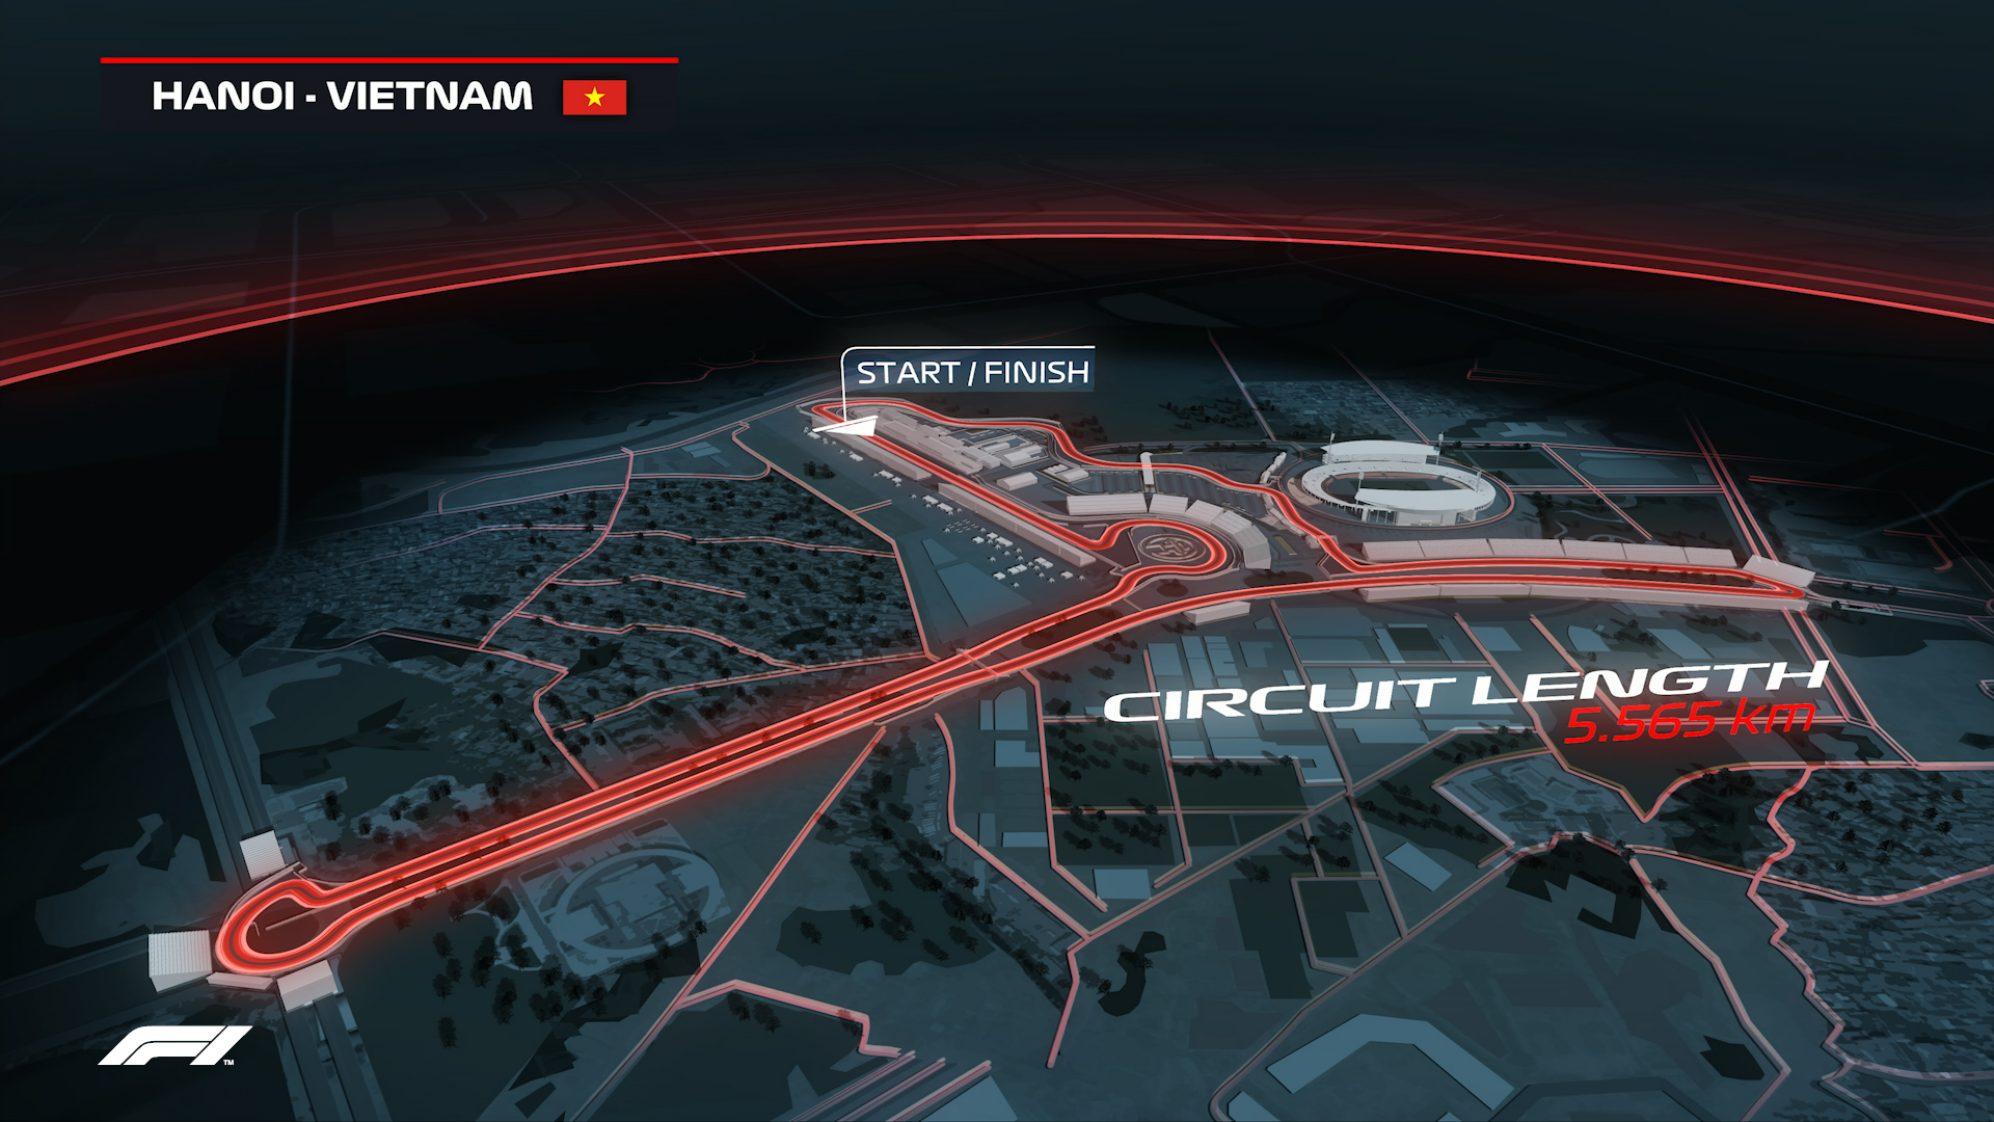 F1 confirms 2020 Vietnamese Grand Prix